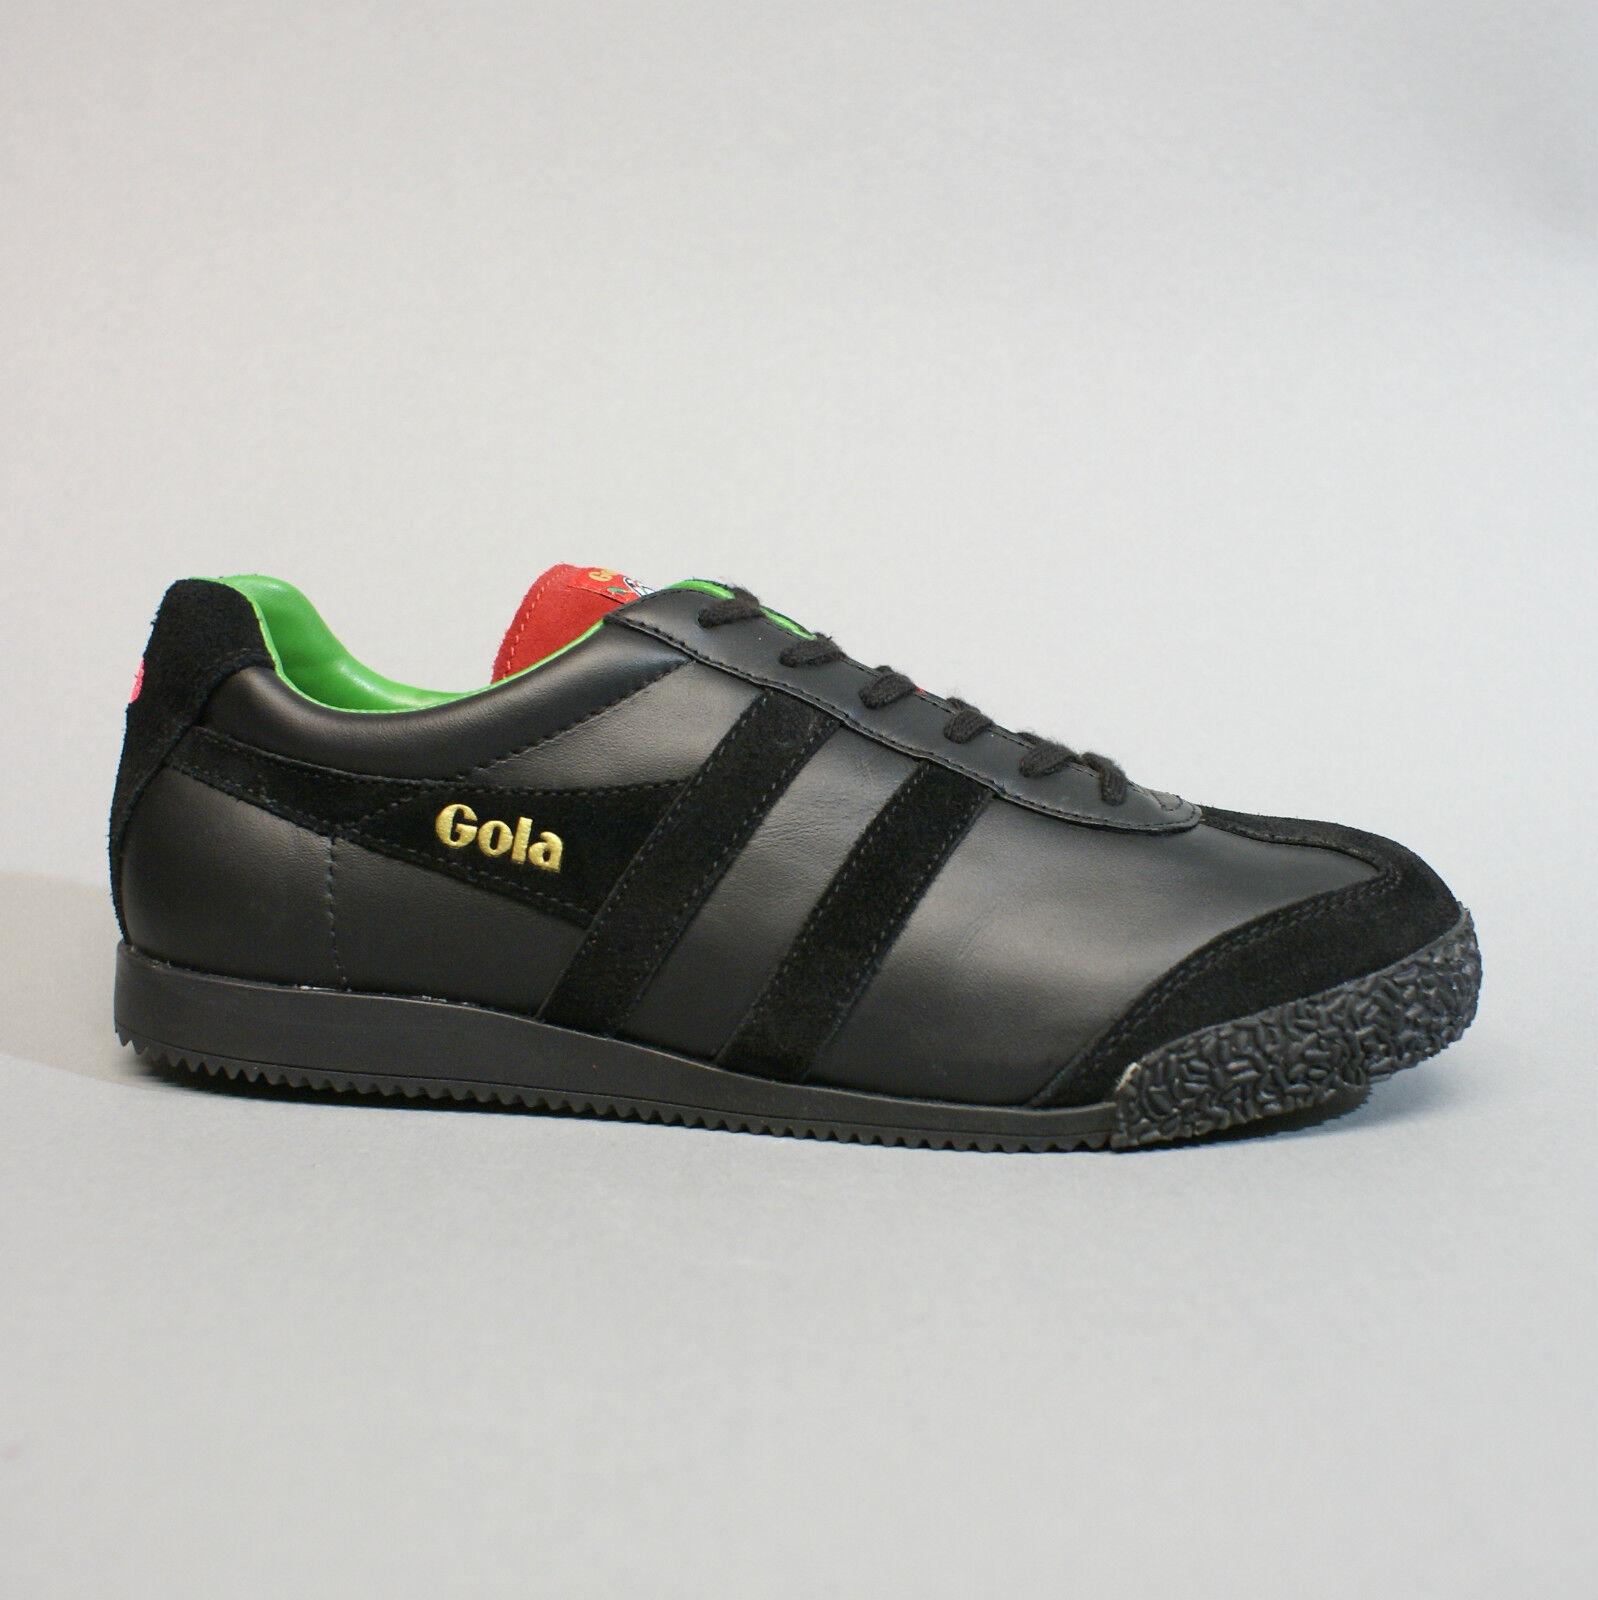 Gola Harrier Pub Games Darts schwarz Leder CMA393 Turnschuhe Sneakers schwarz Leder schwarz bf1263